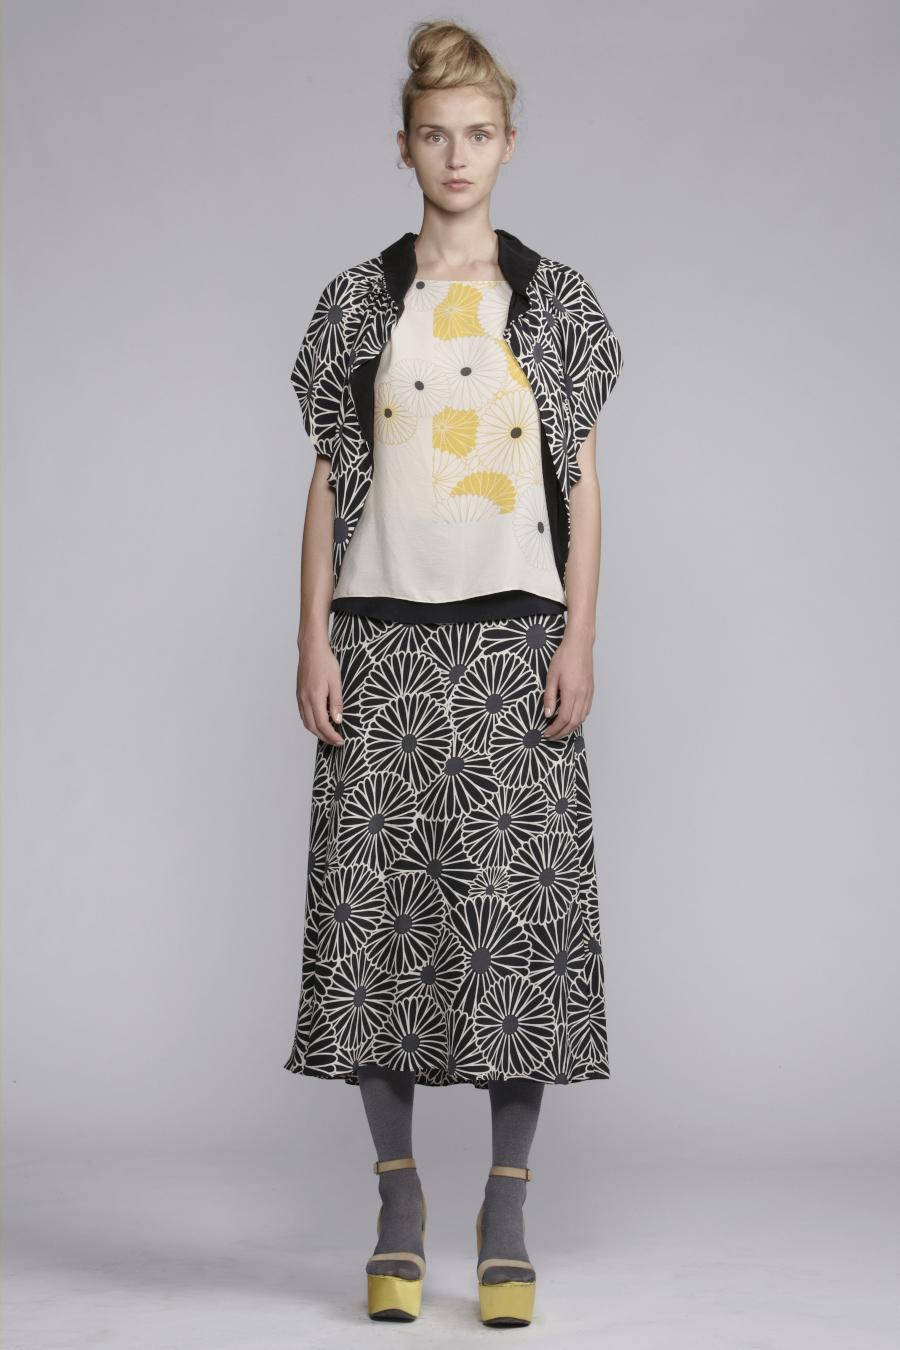 245/A133410 Top     250/A135231 Printed Skirt     250/A138205 Spiral Shibori Bolero